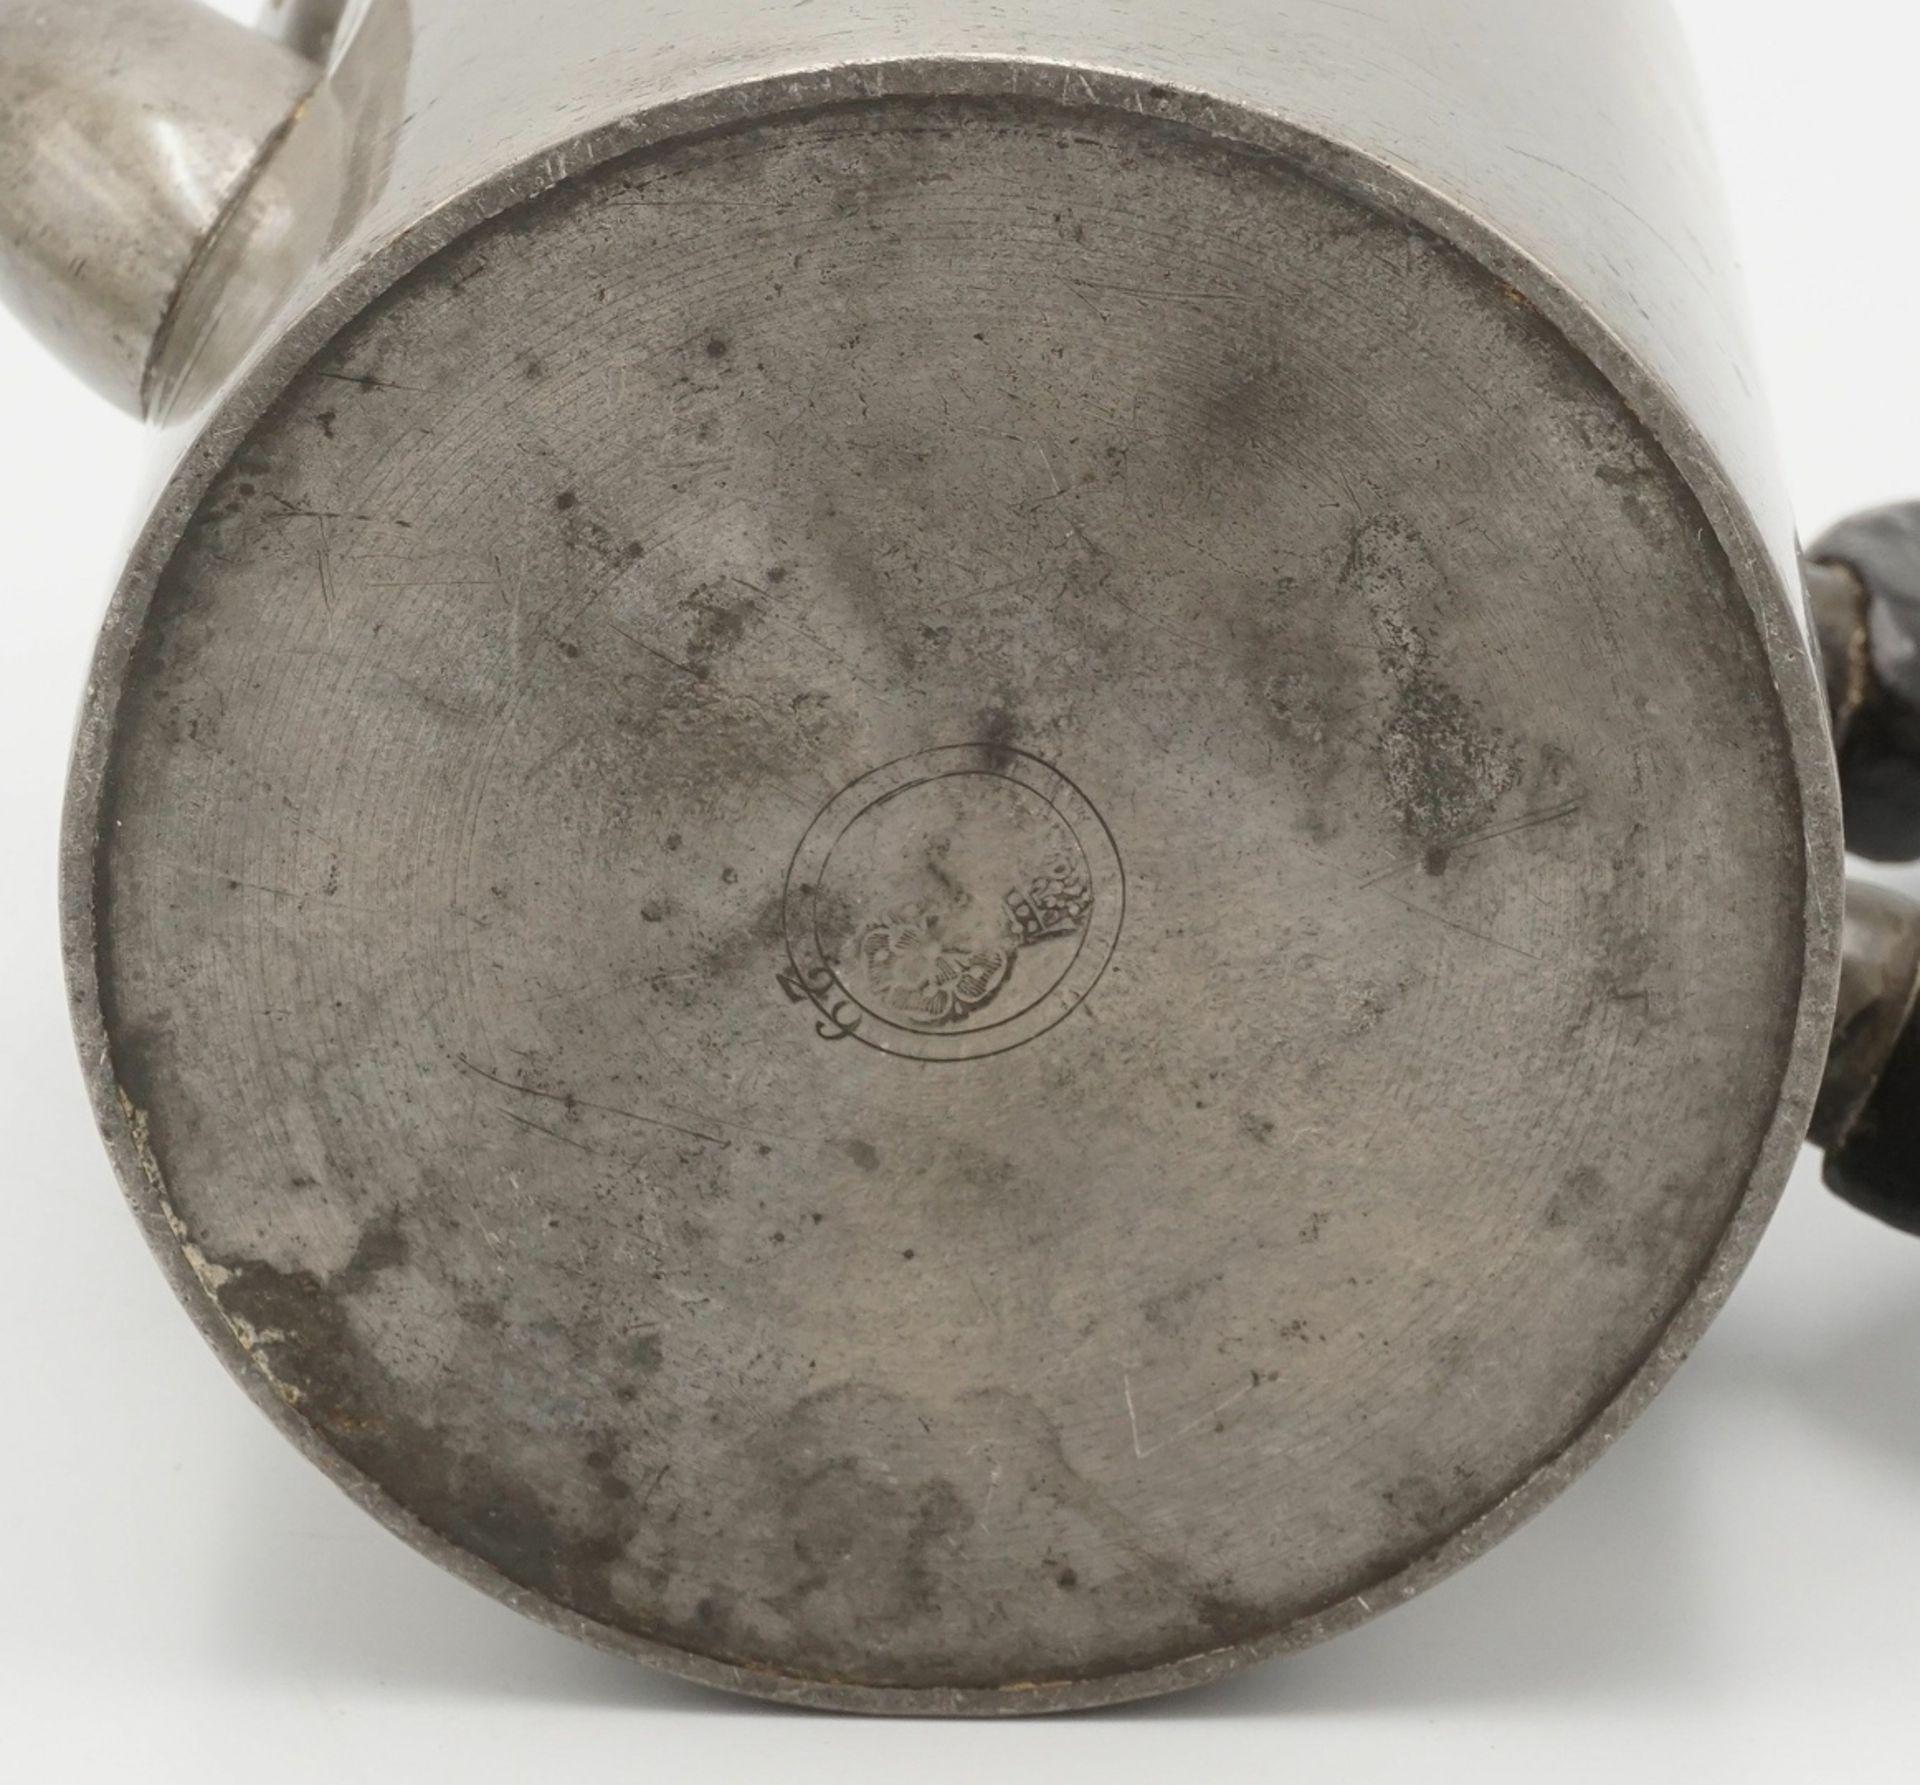 Biedermeier Zinnkanne, um 1840 - Bild 3 aus 3